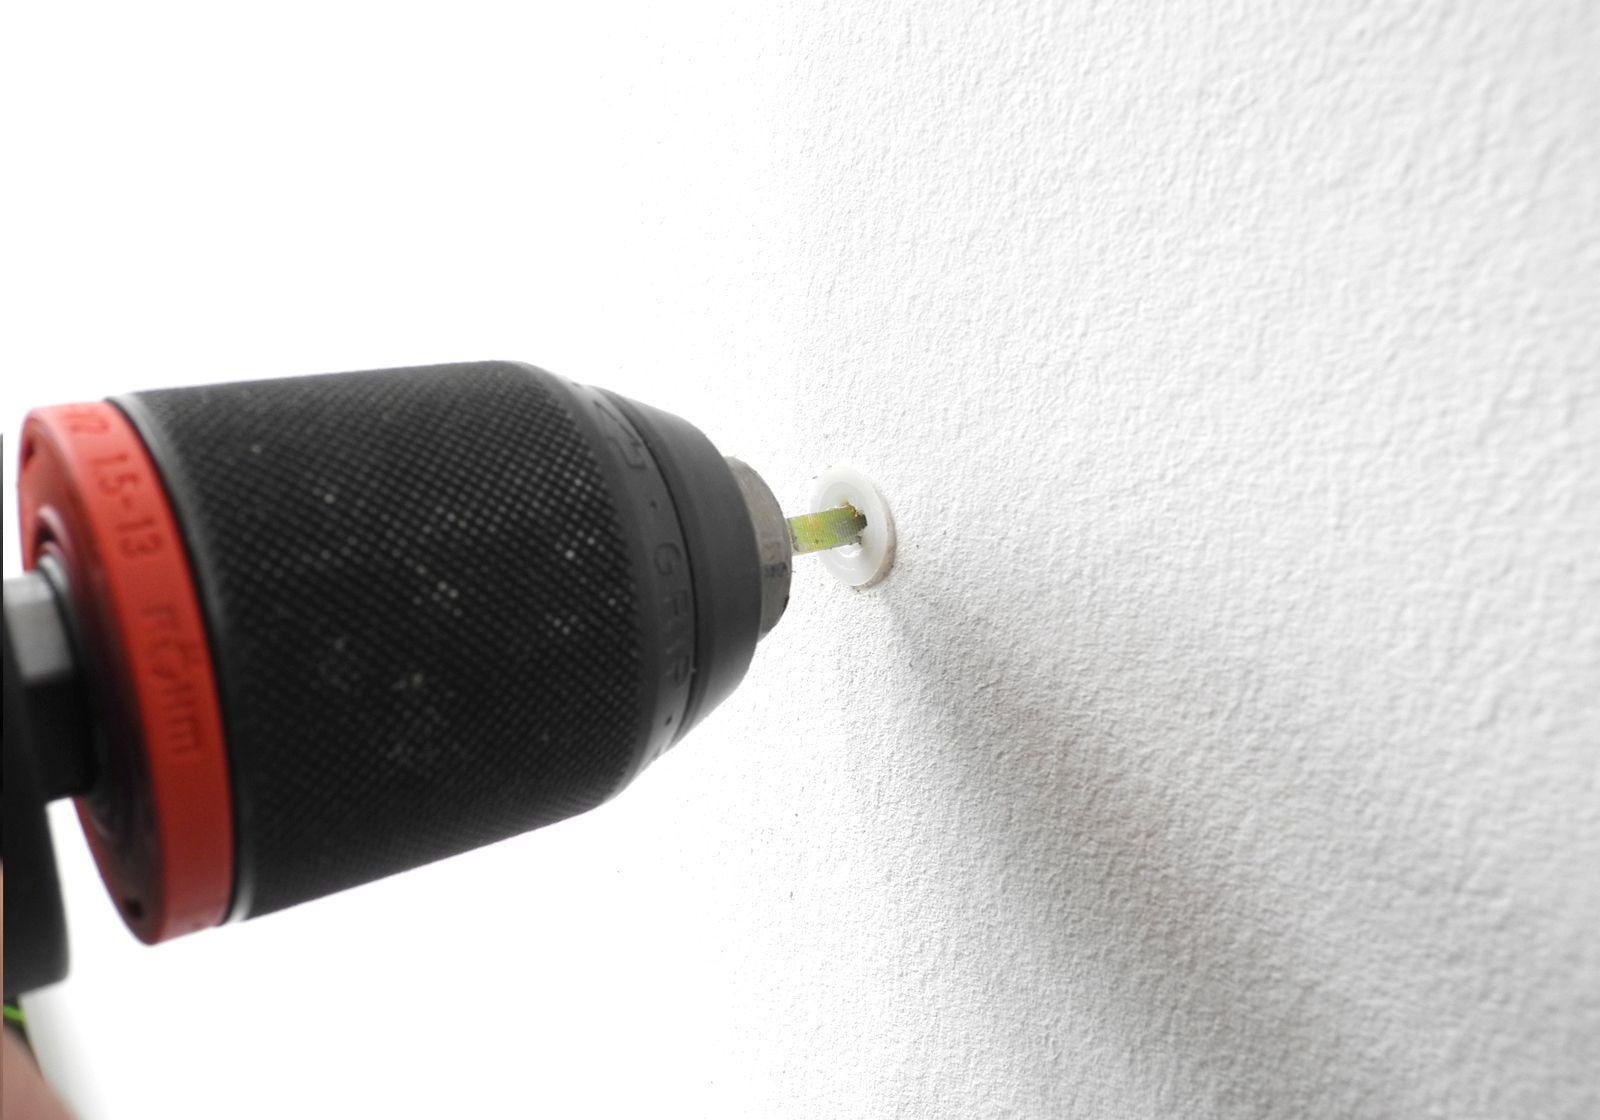 teebooks 12 cheville pour placo platre w max. Black Bedroom Furniture Sets. Home Design Ideas